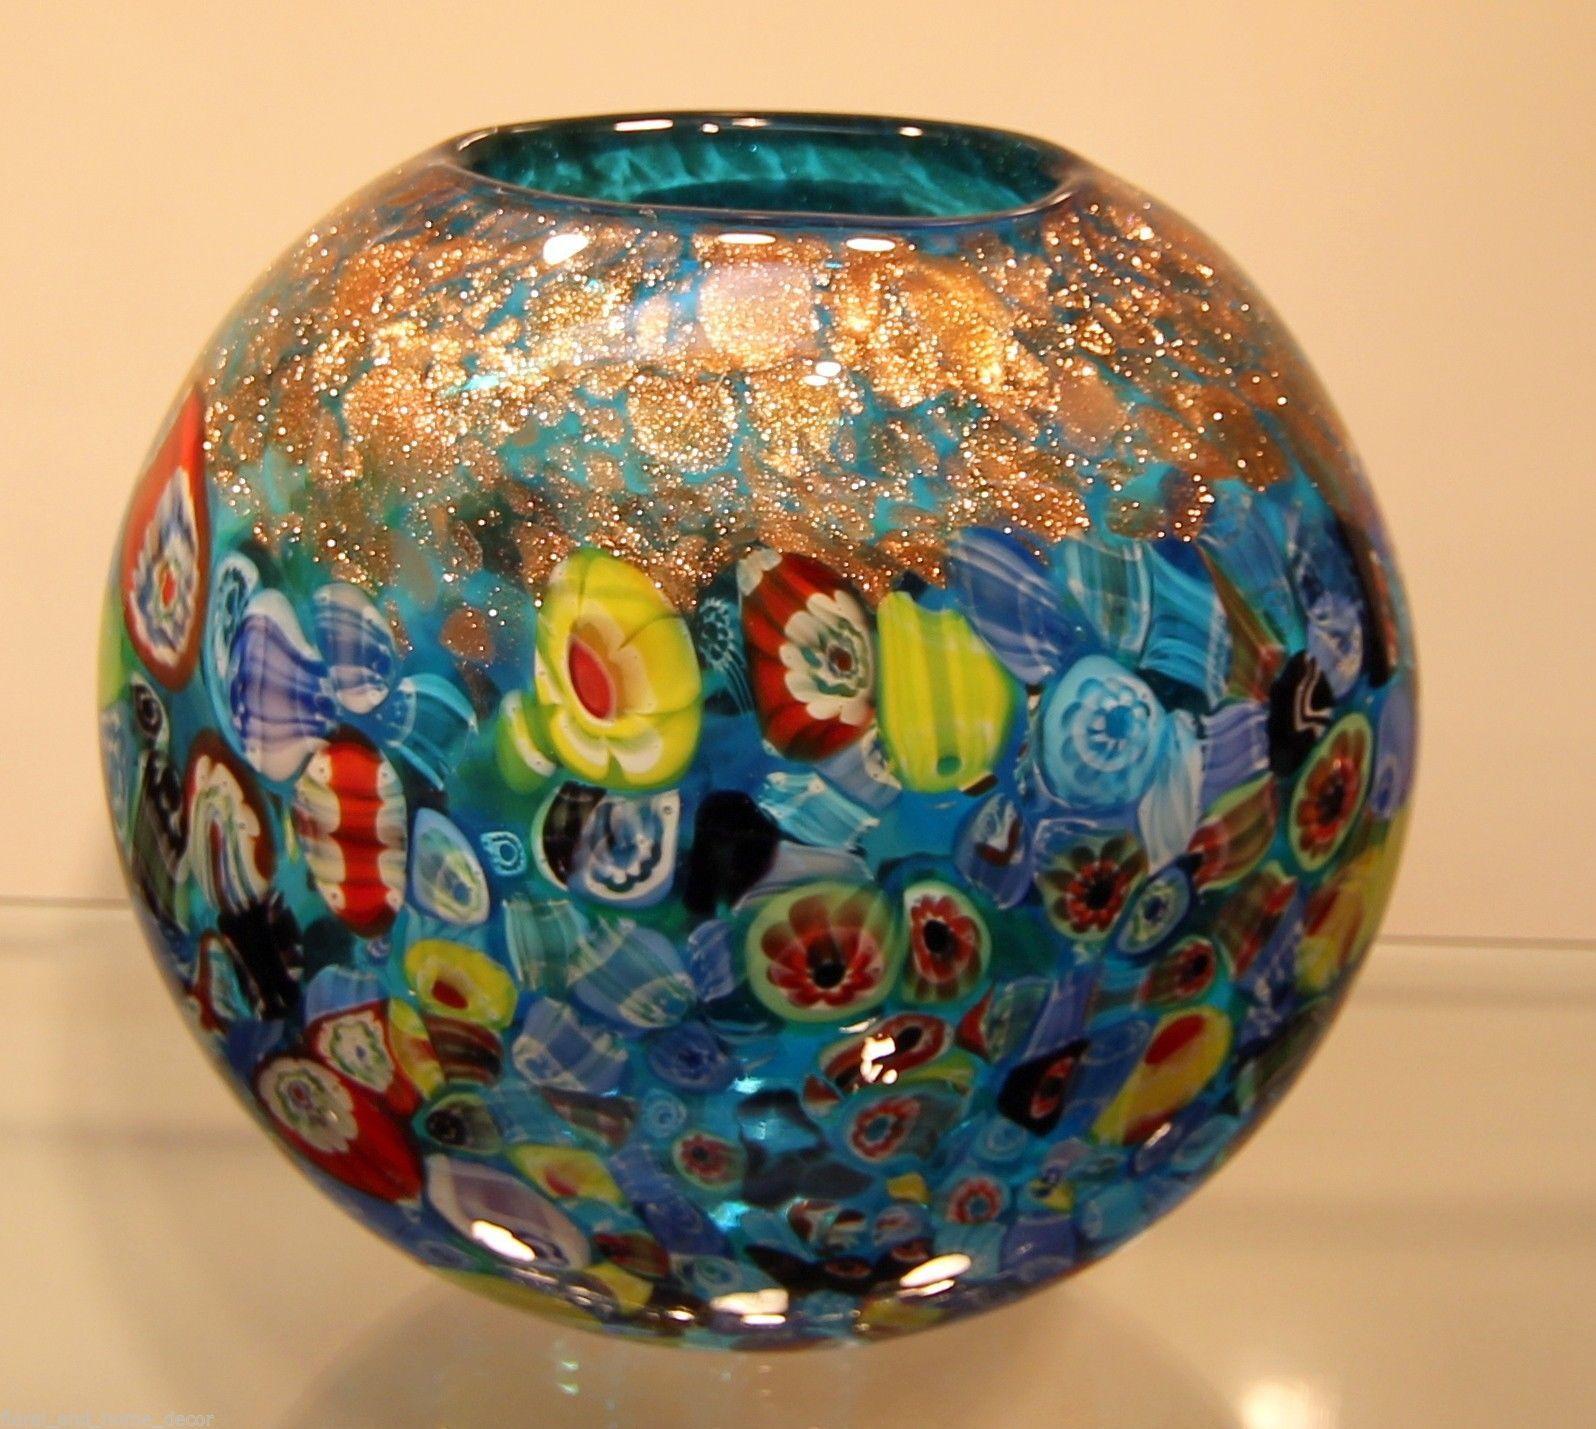 New 7 hand blown glass murano art style vase blue italian new 7 hand blown glass murano art style vase blue italian millefiori multicolor ebay reviewsmspy